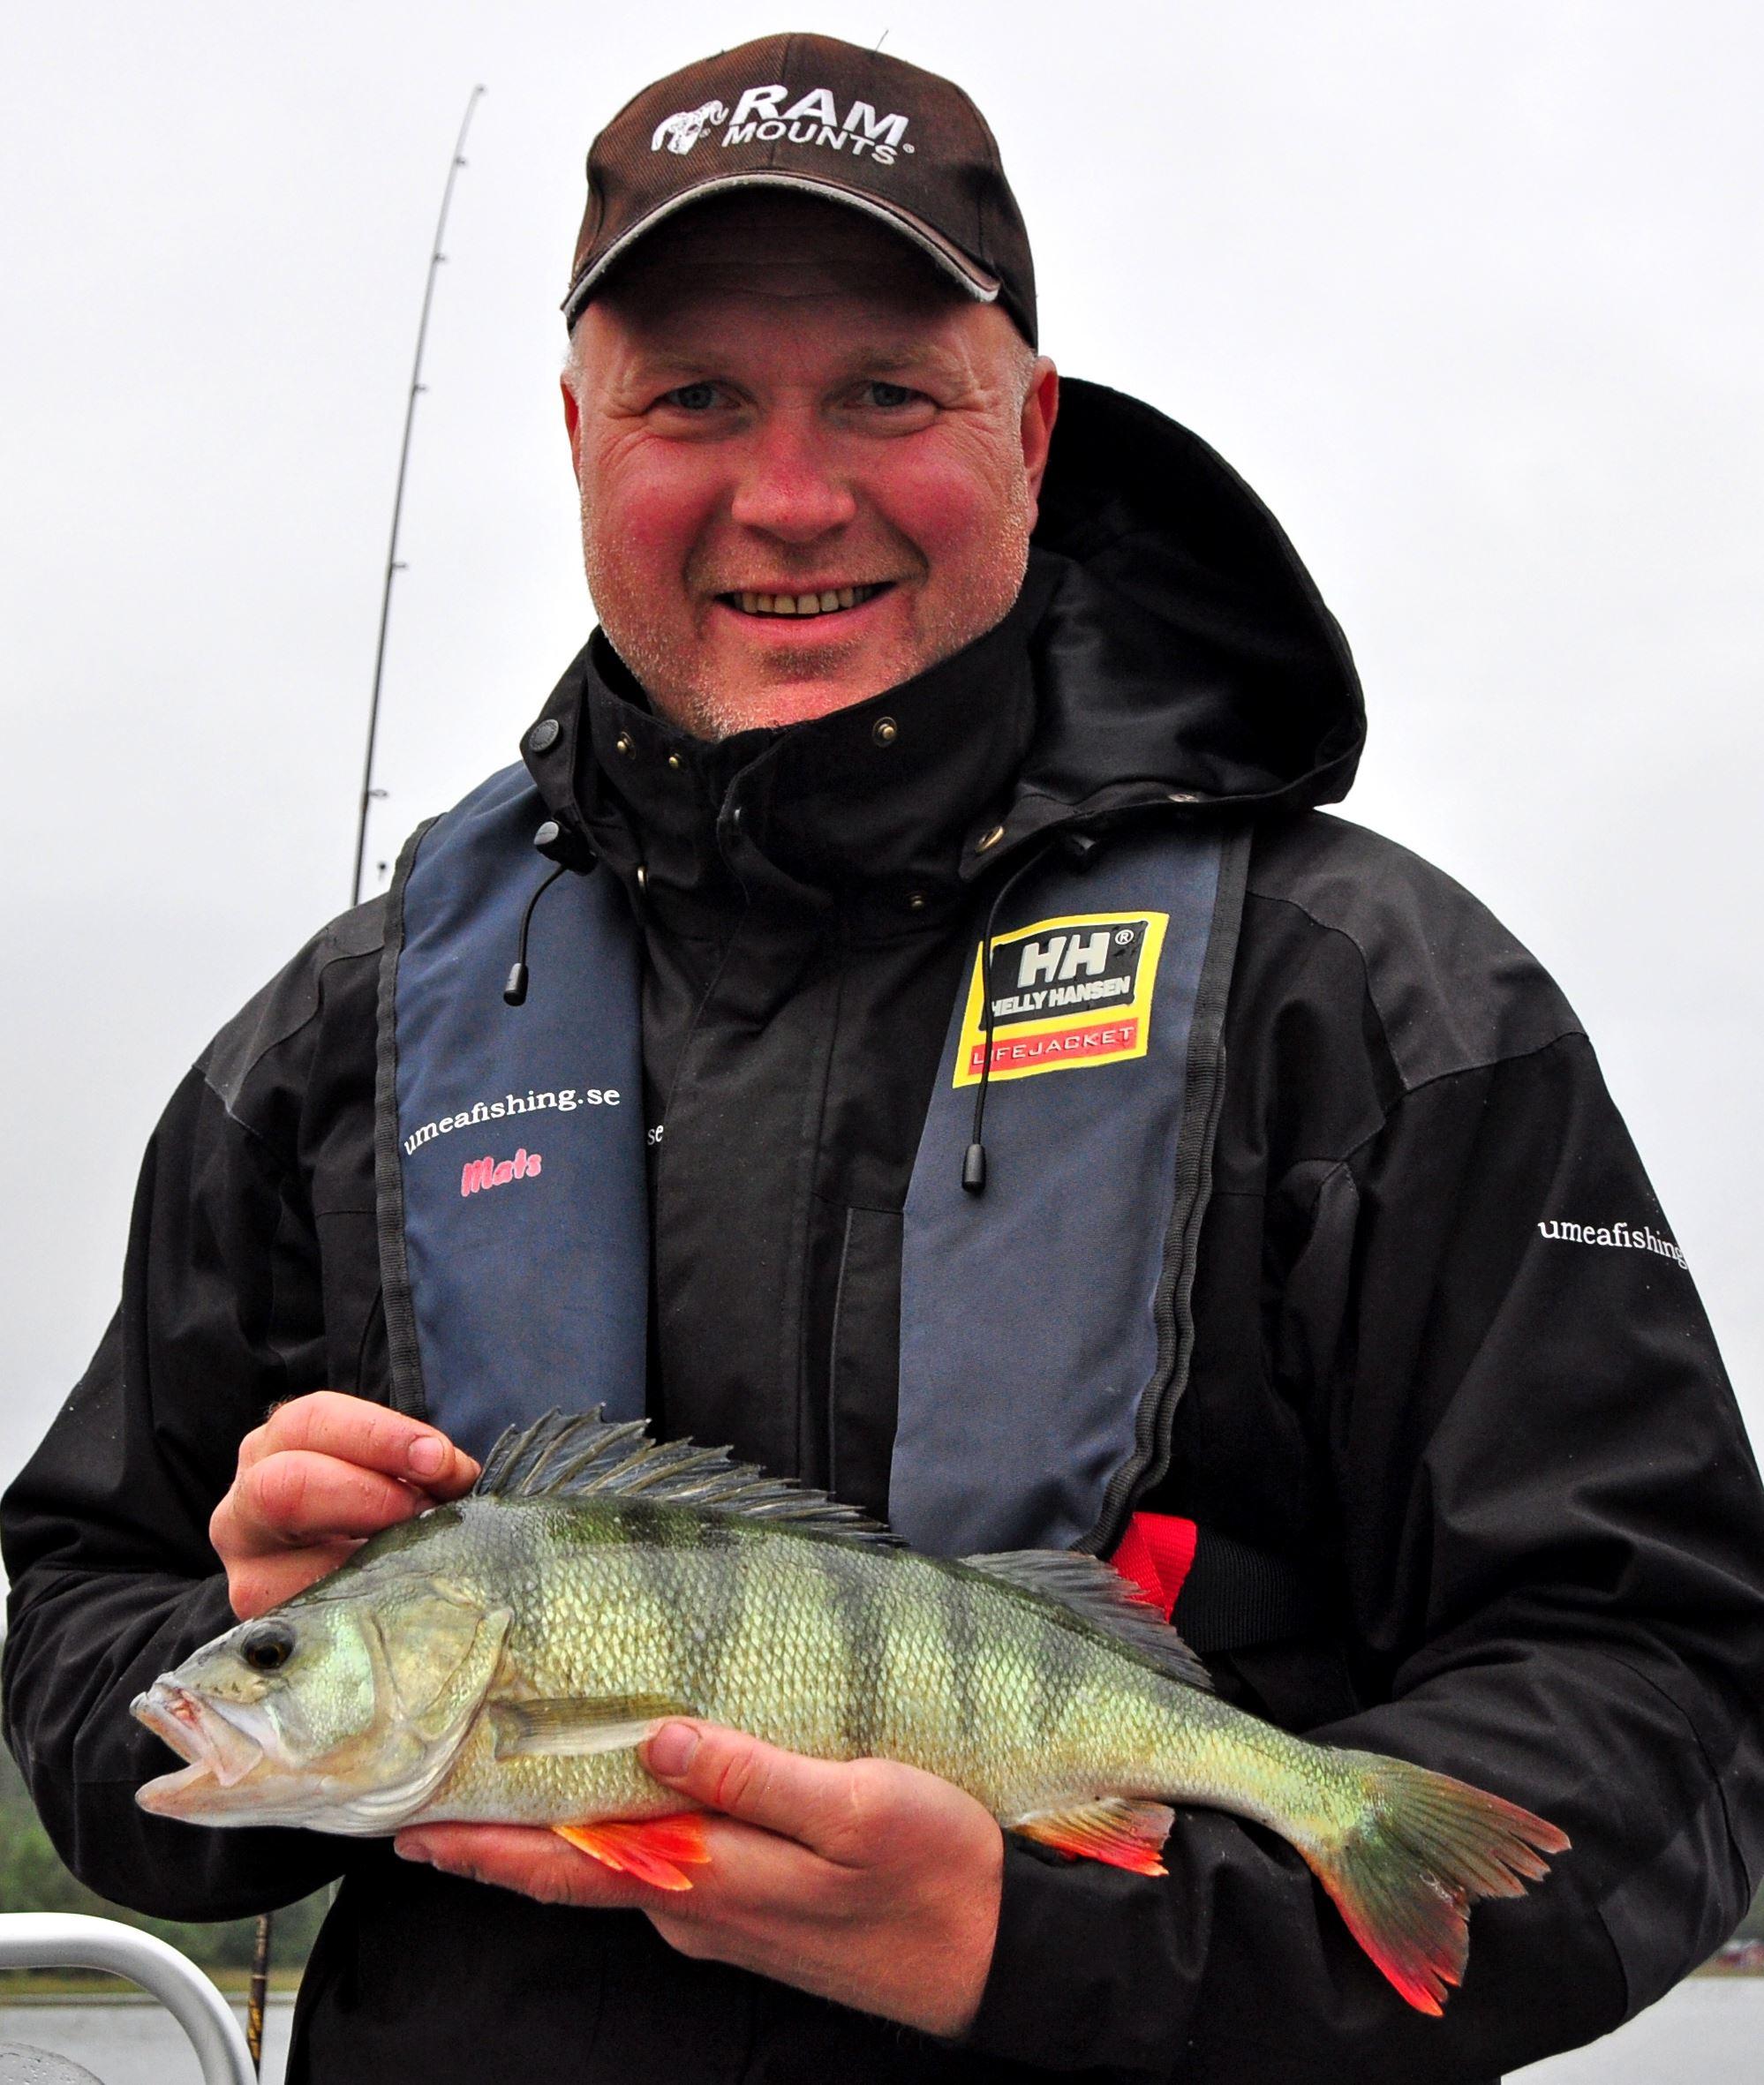 umeafishing.se,  © umeafishing.se, umeafishing.se